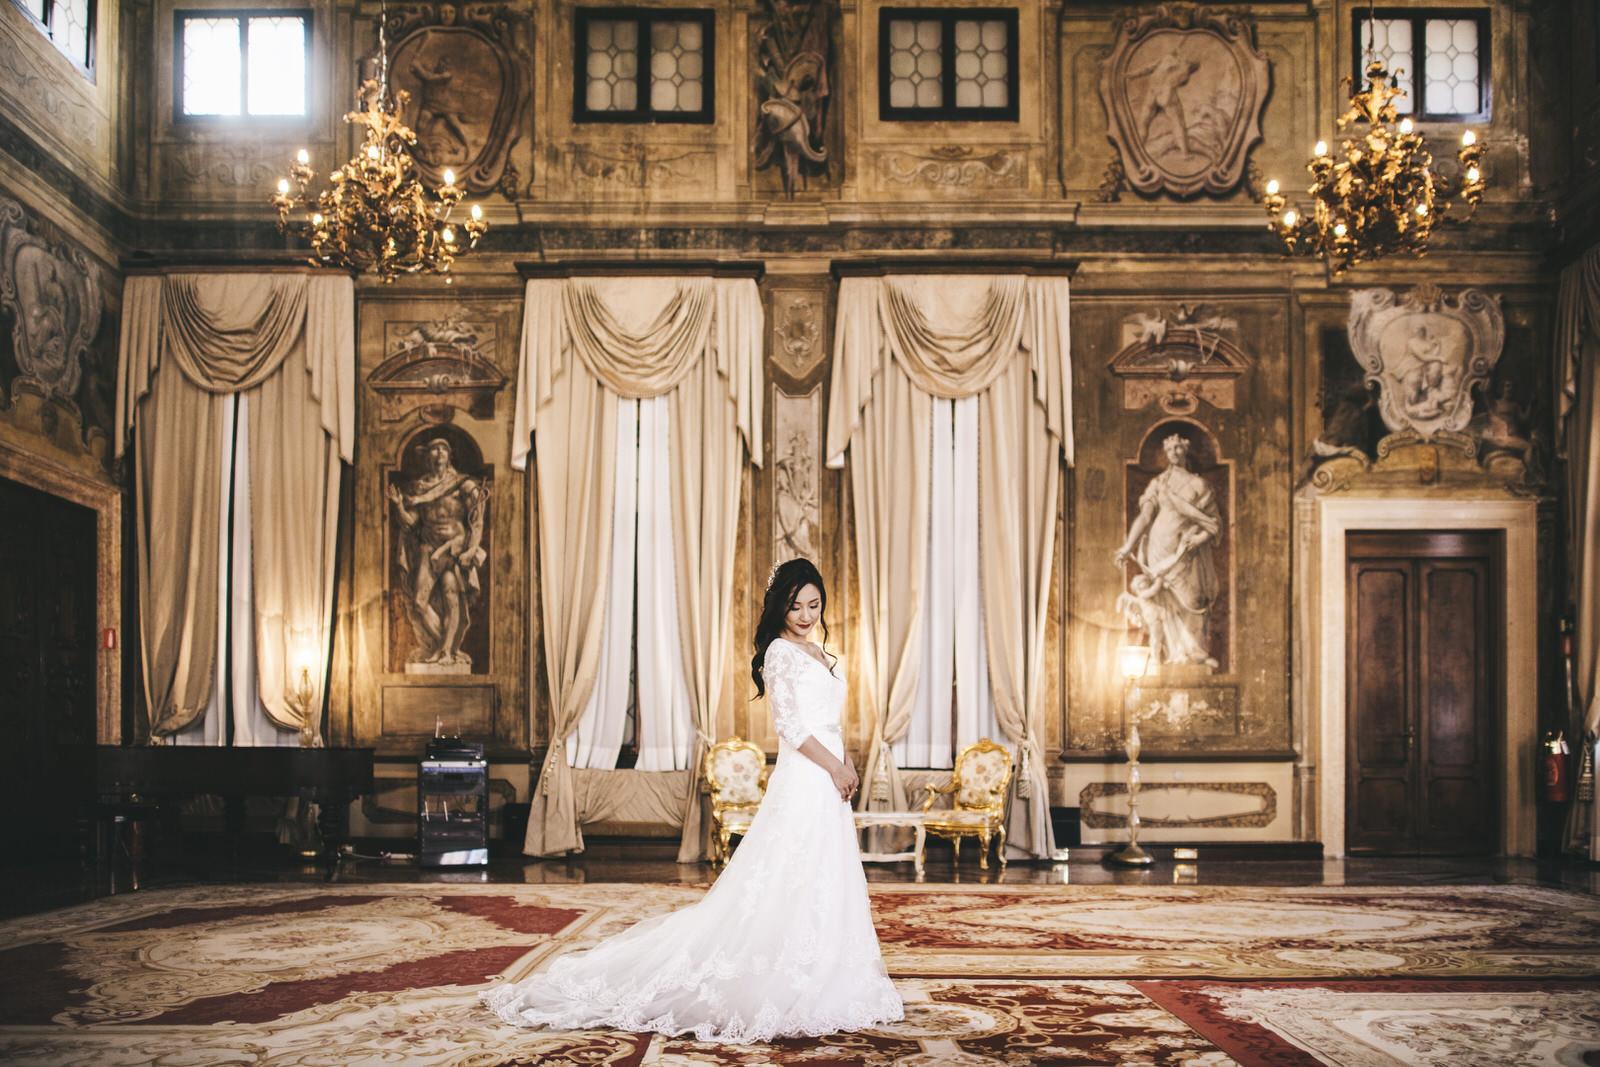 wedding photographer in italy-venice-tuscany-florence-amalfi coast-como lake-villa del balbianello-siena-amalfi-ravello-belmond-villa cimbrone27